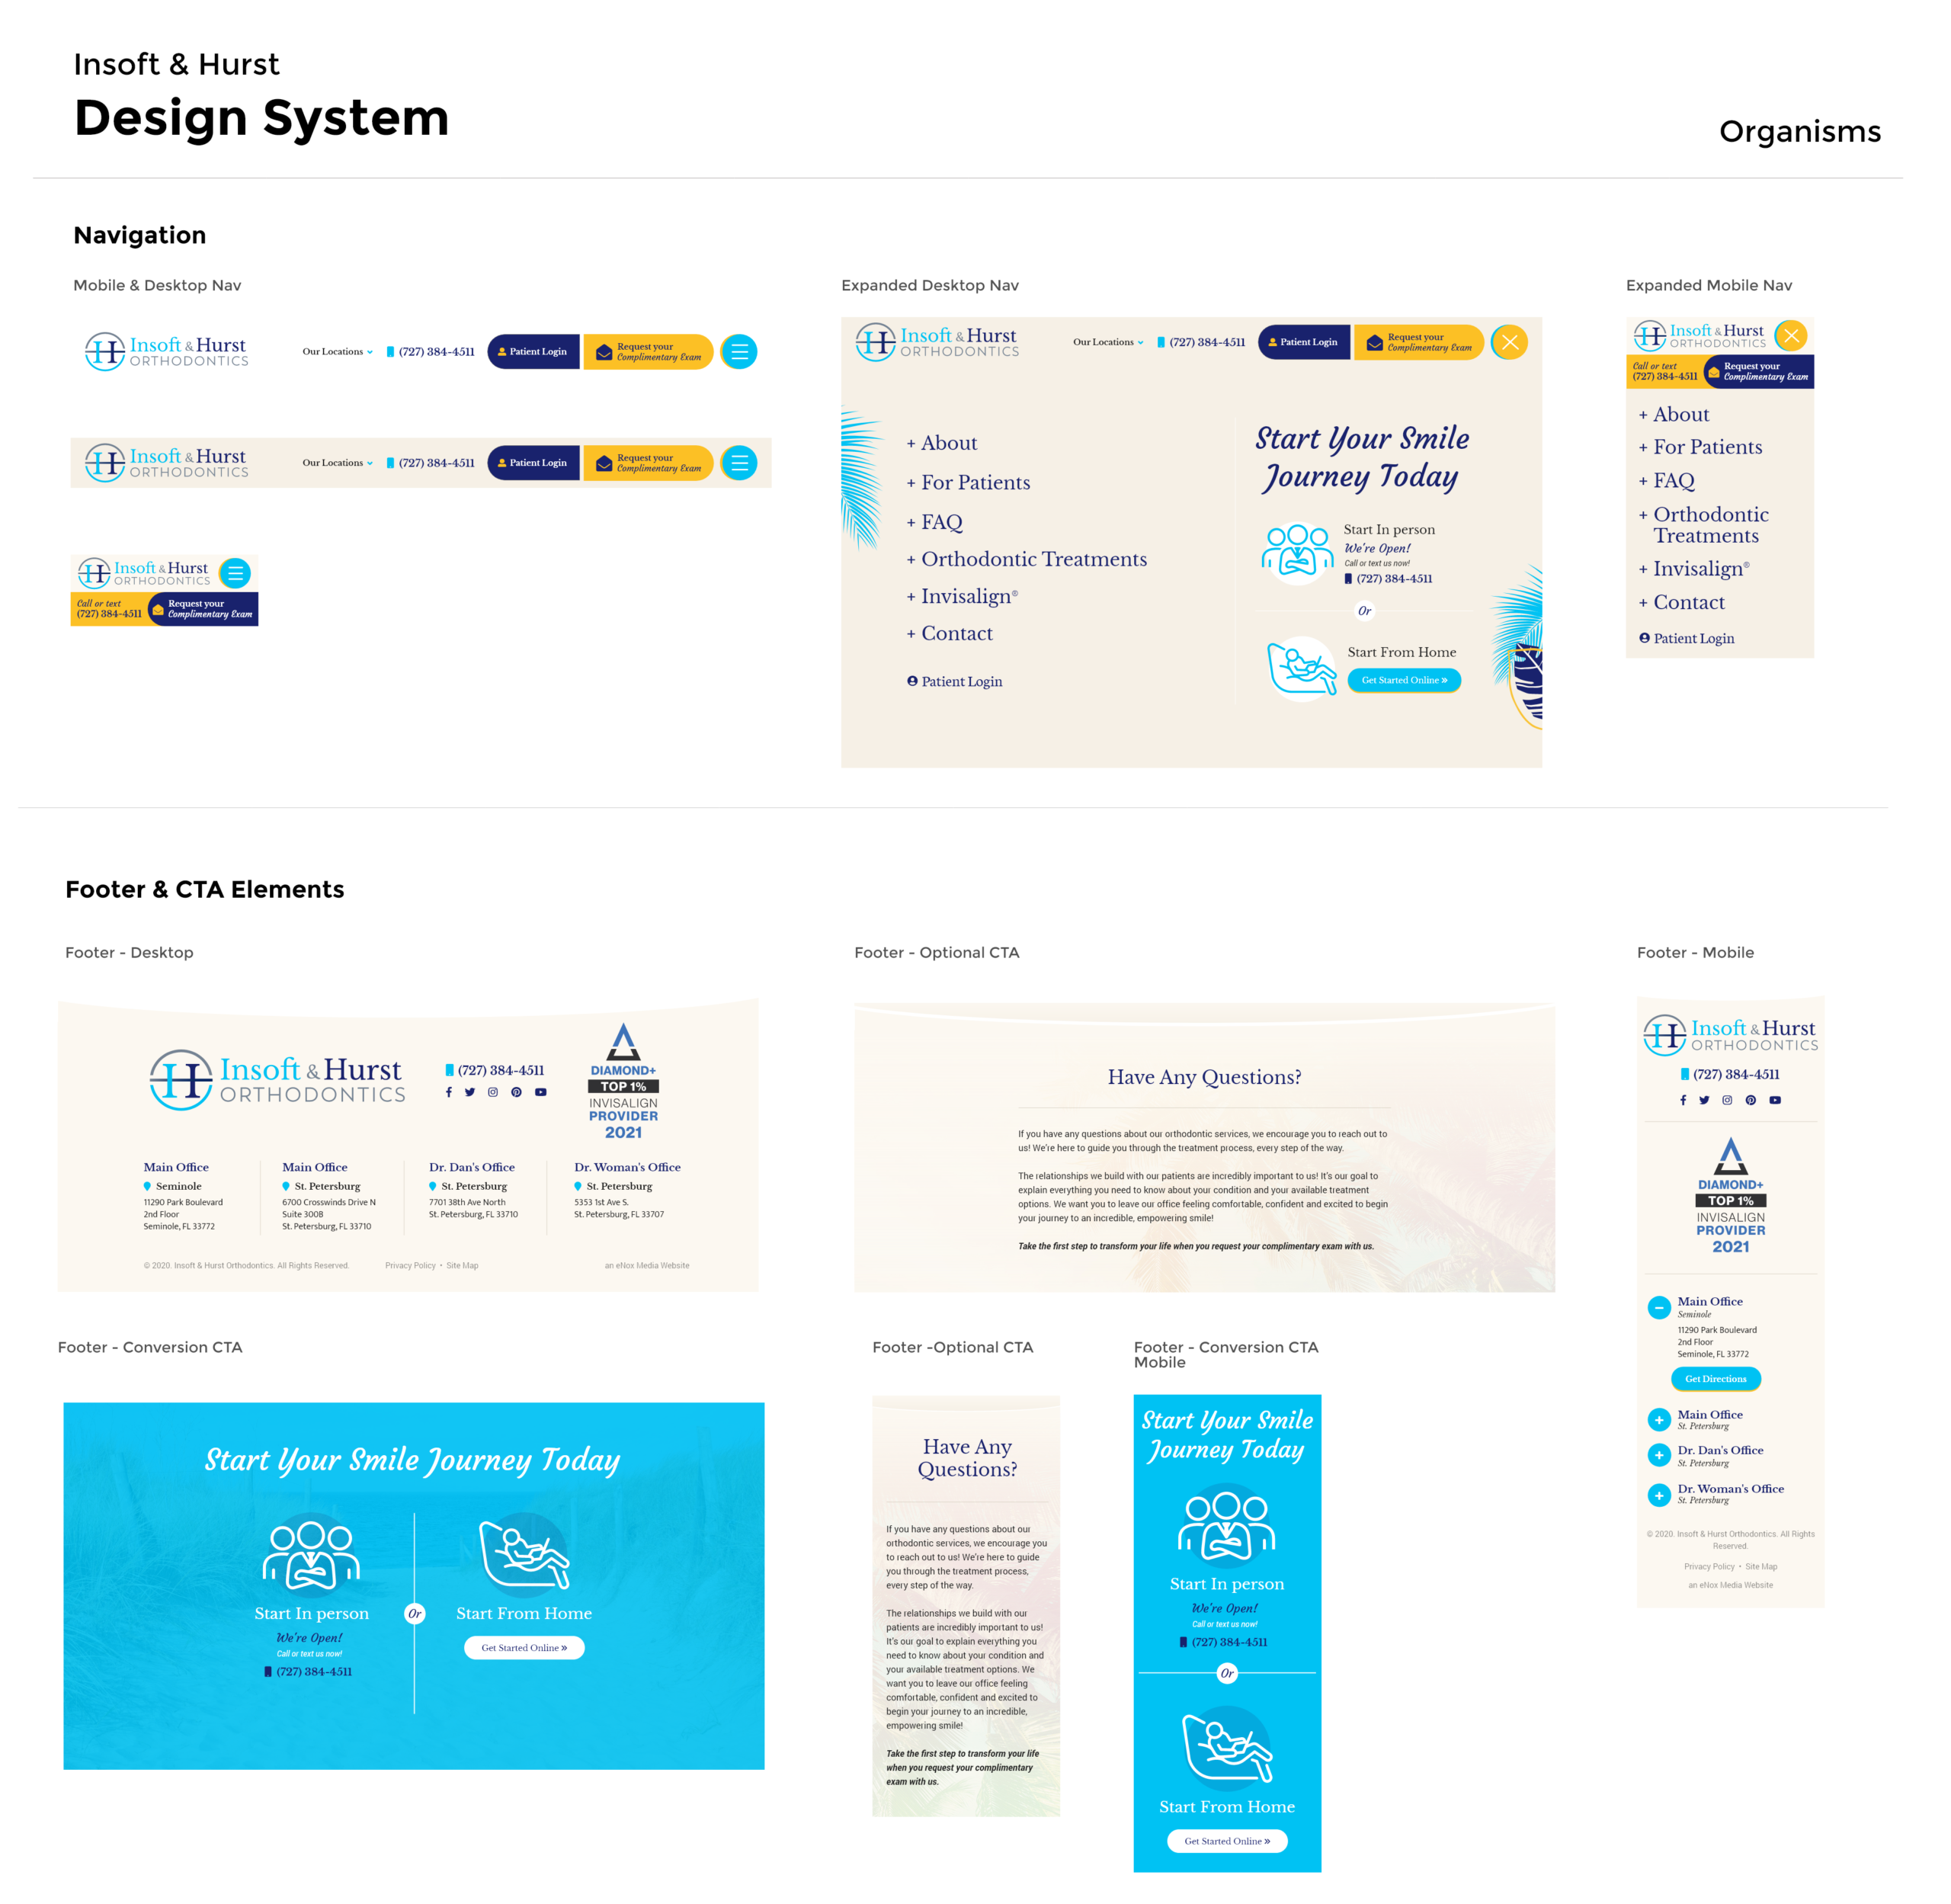 Insoft & Hurst Design System Organisms